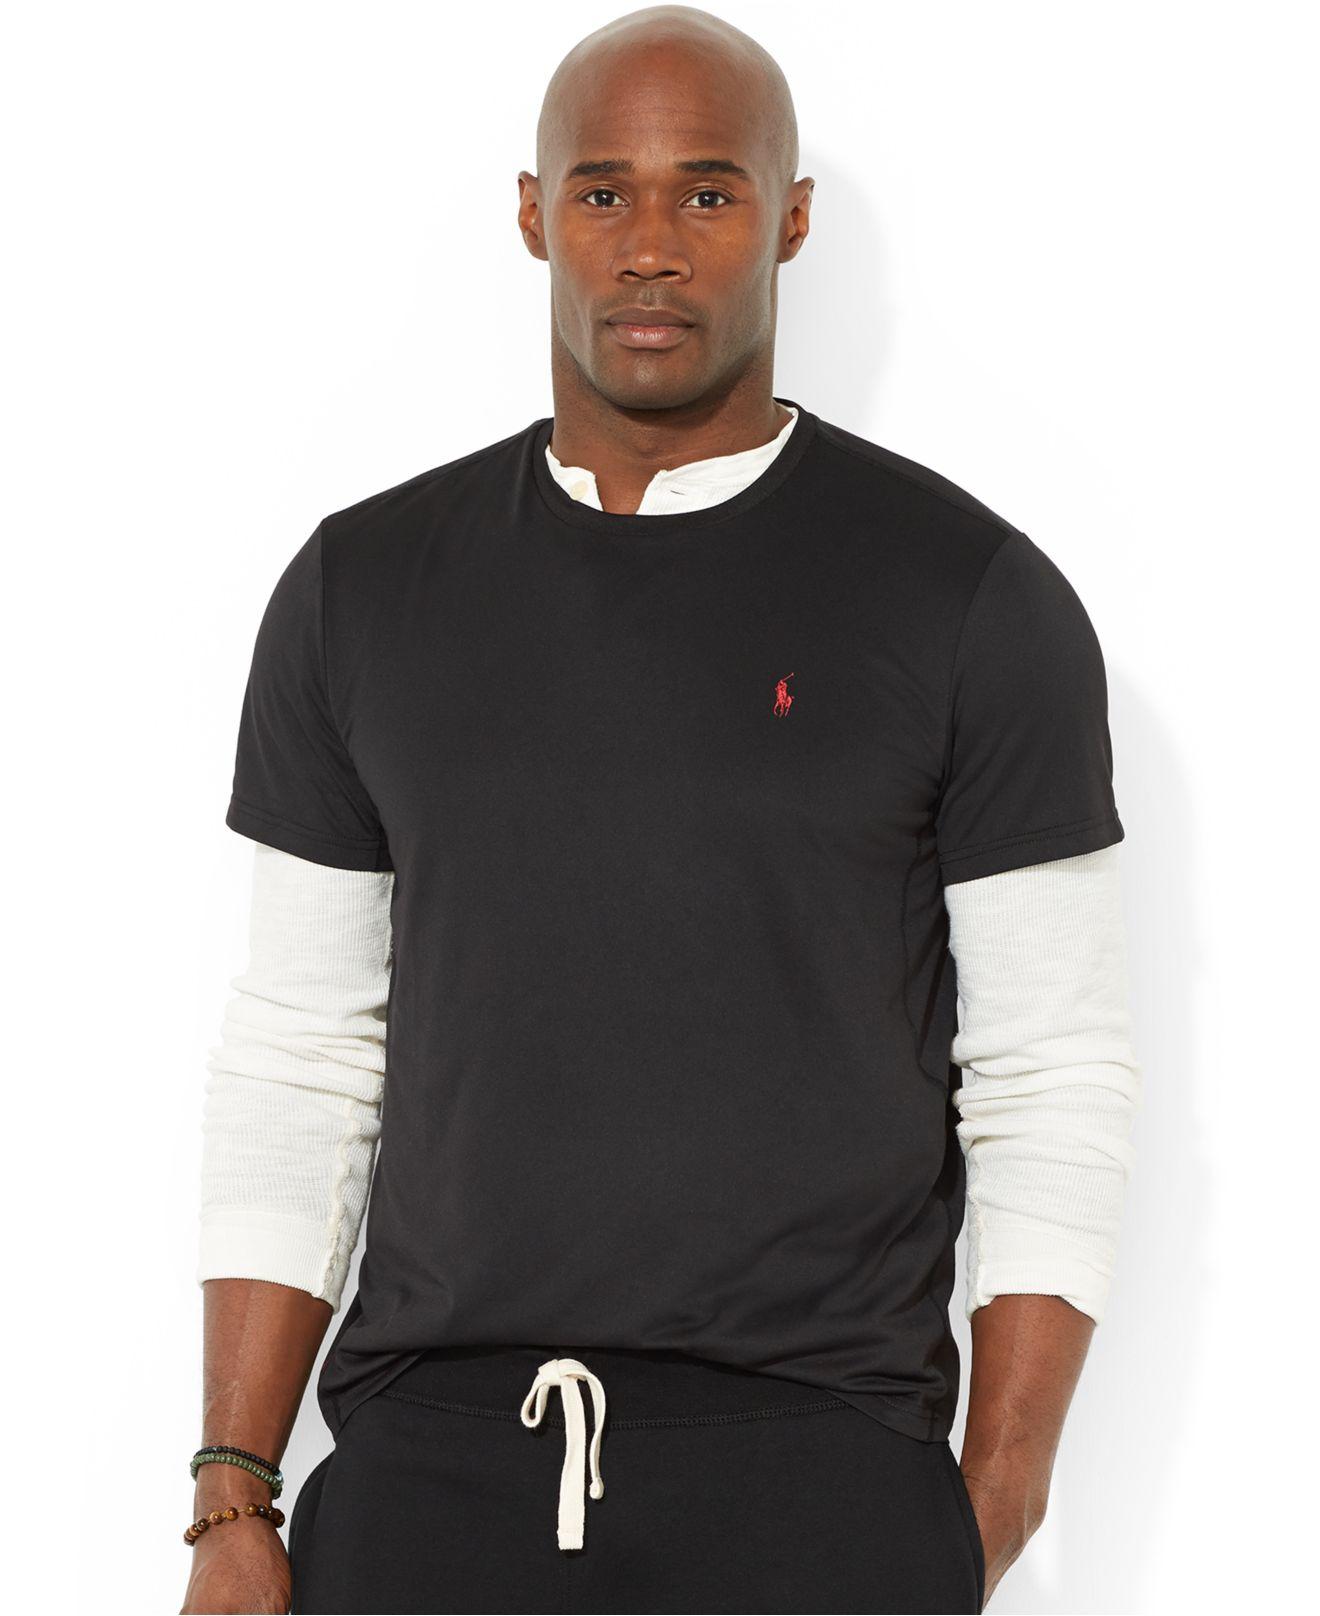 Polo ralph lauren Big And Tall Short-Sleeve Performance Crew-Neck T-Shirt